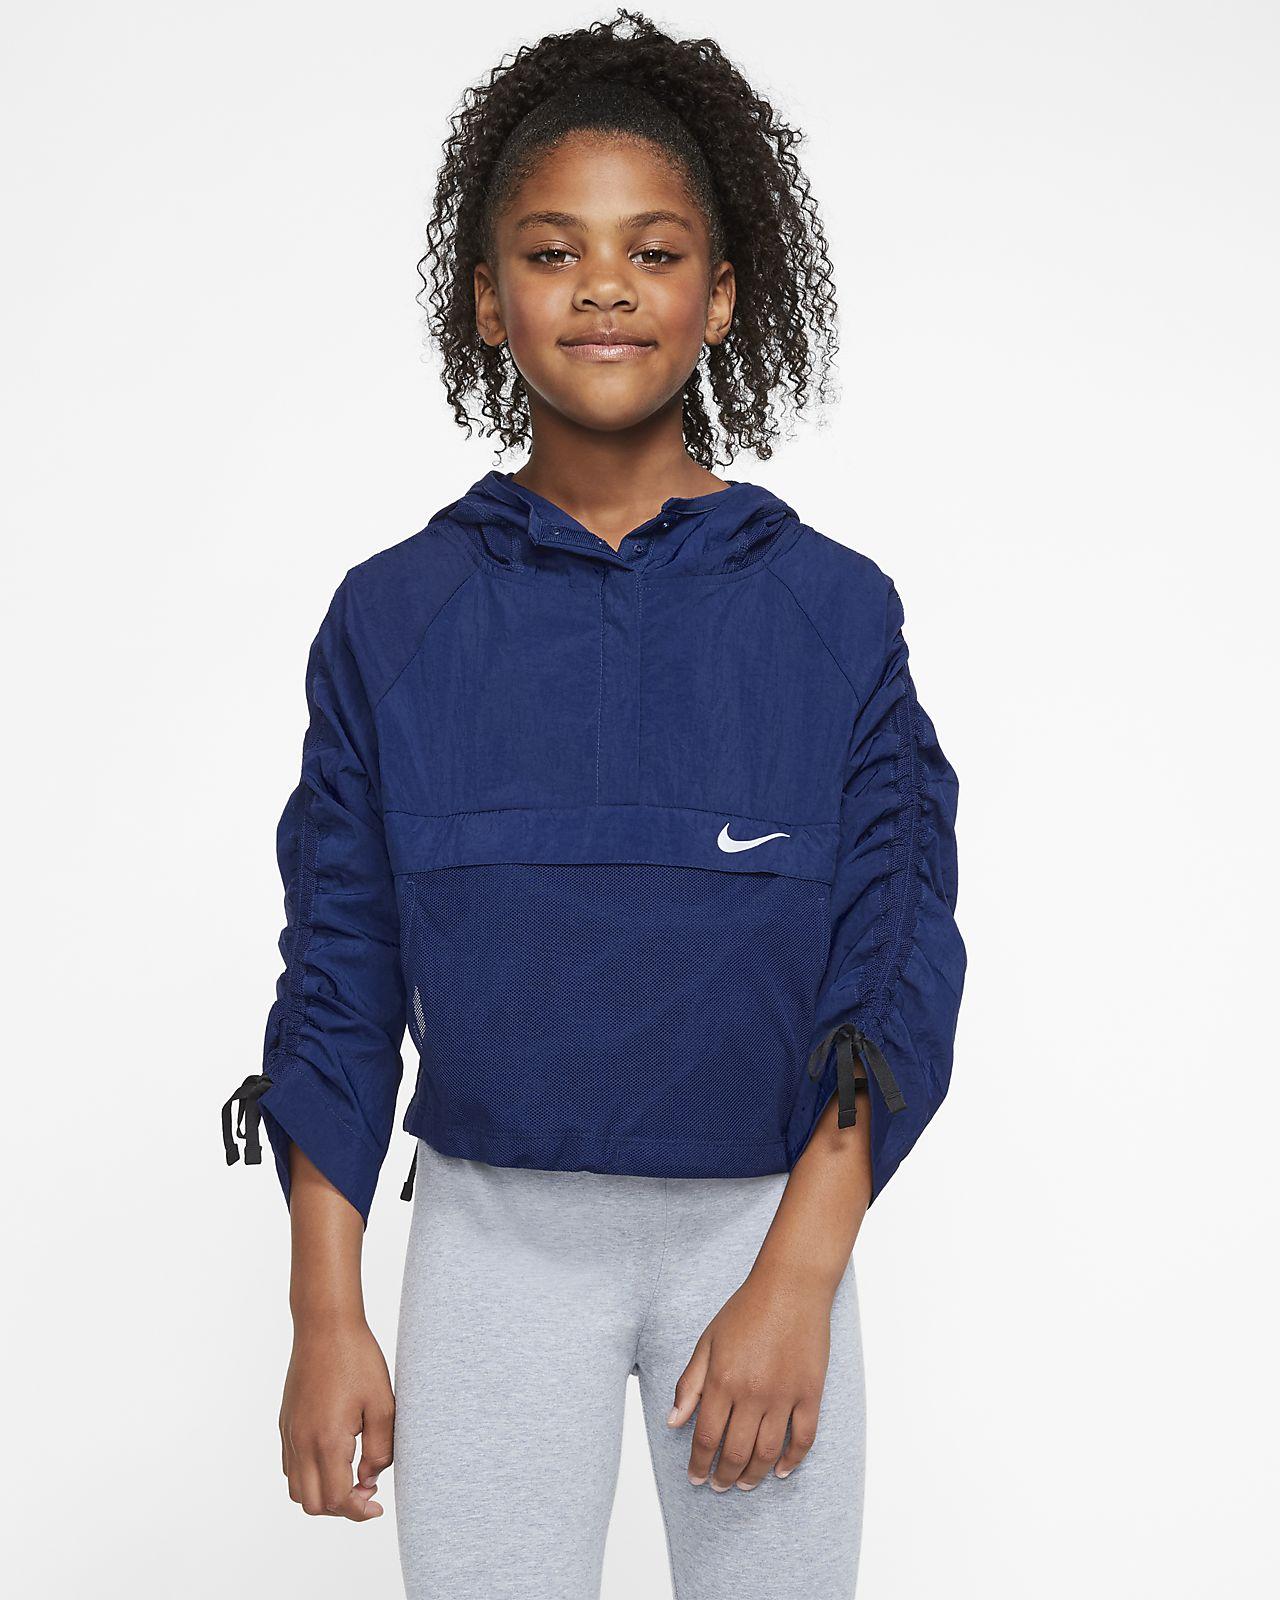 Hip Pack-It Nike Sportswear pour Fille plus âgée